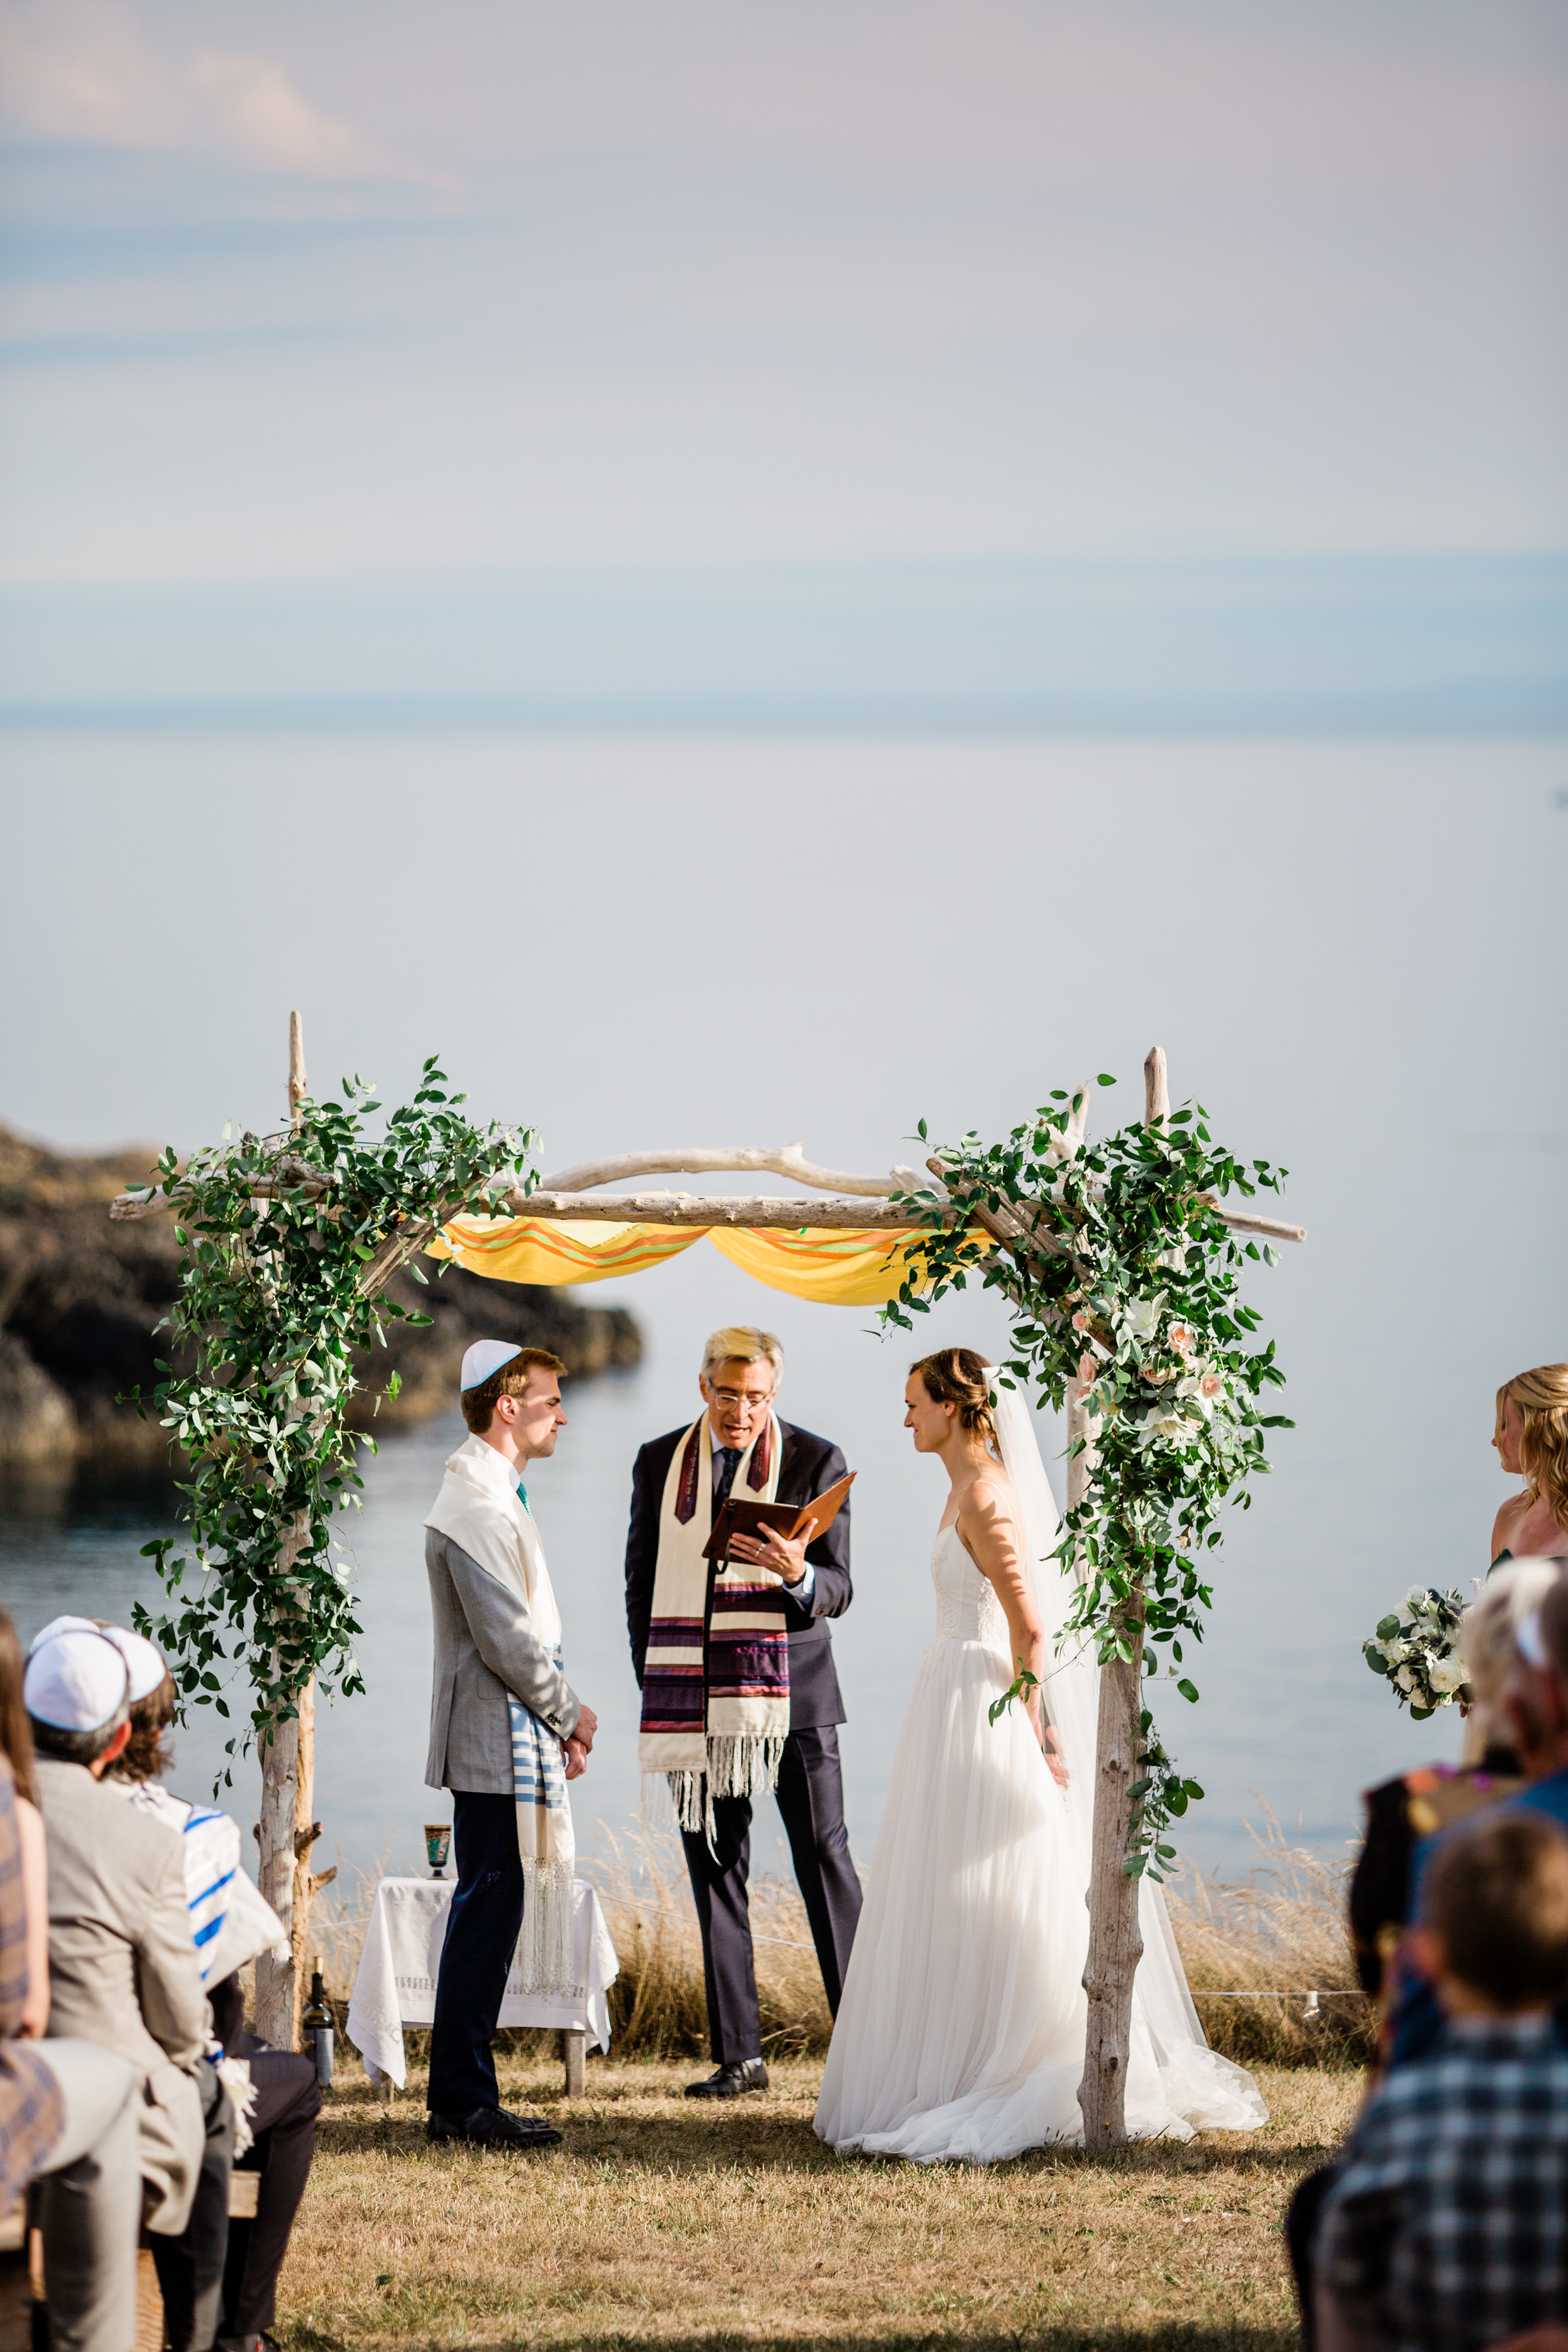 Jewish ceremony under seaside chuppah - photo by Alante Photography